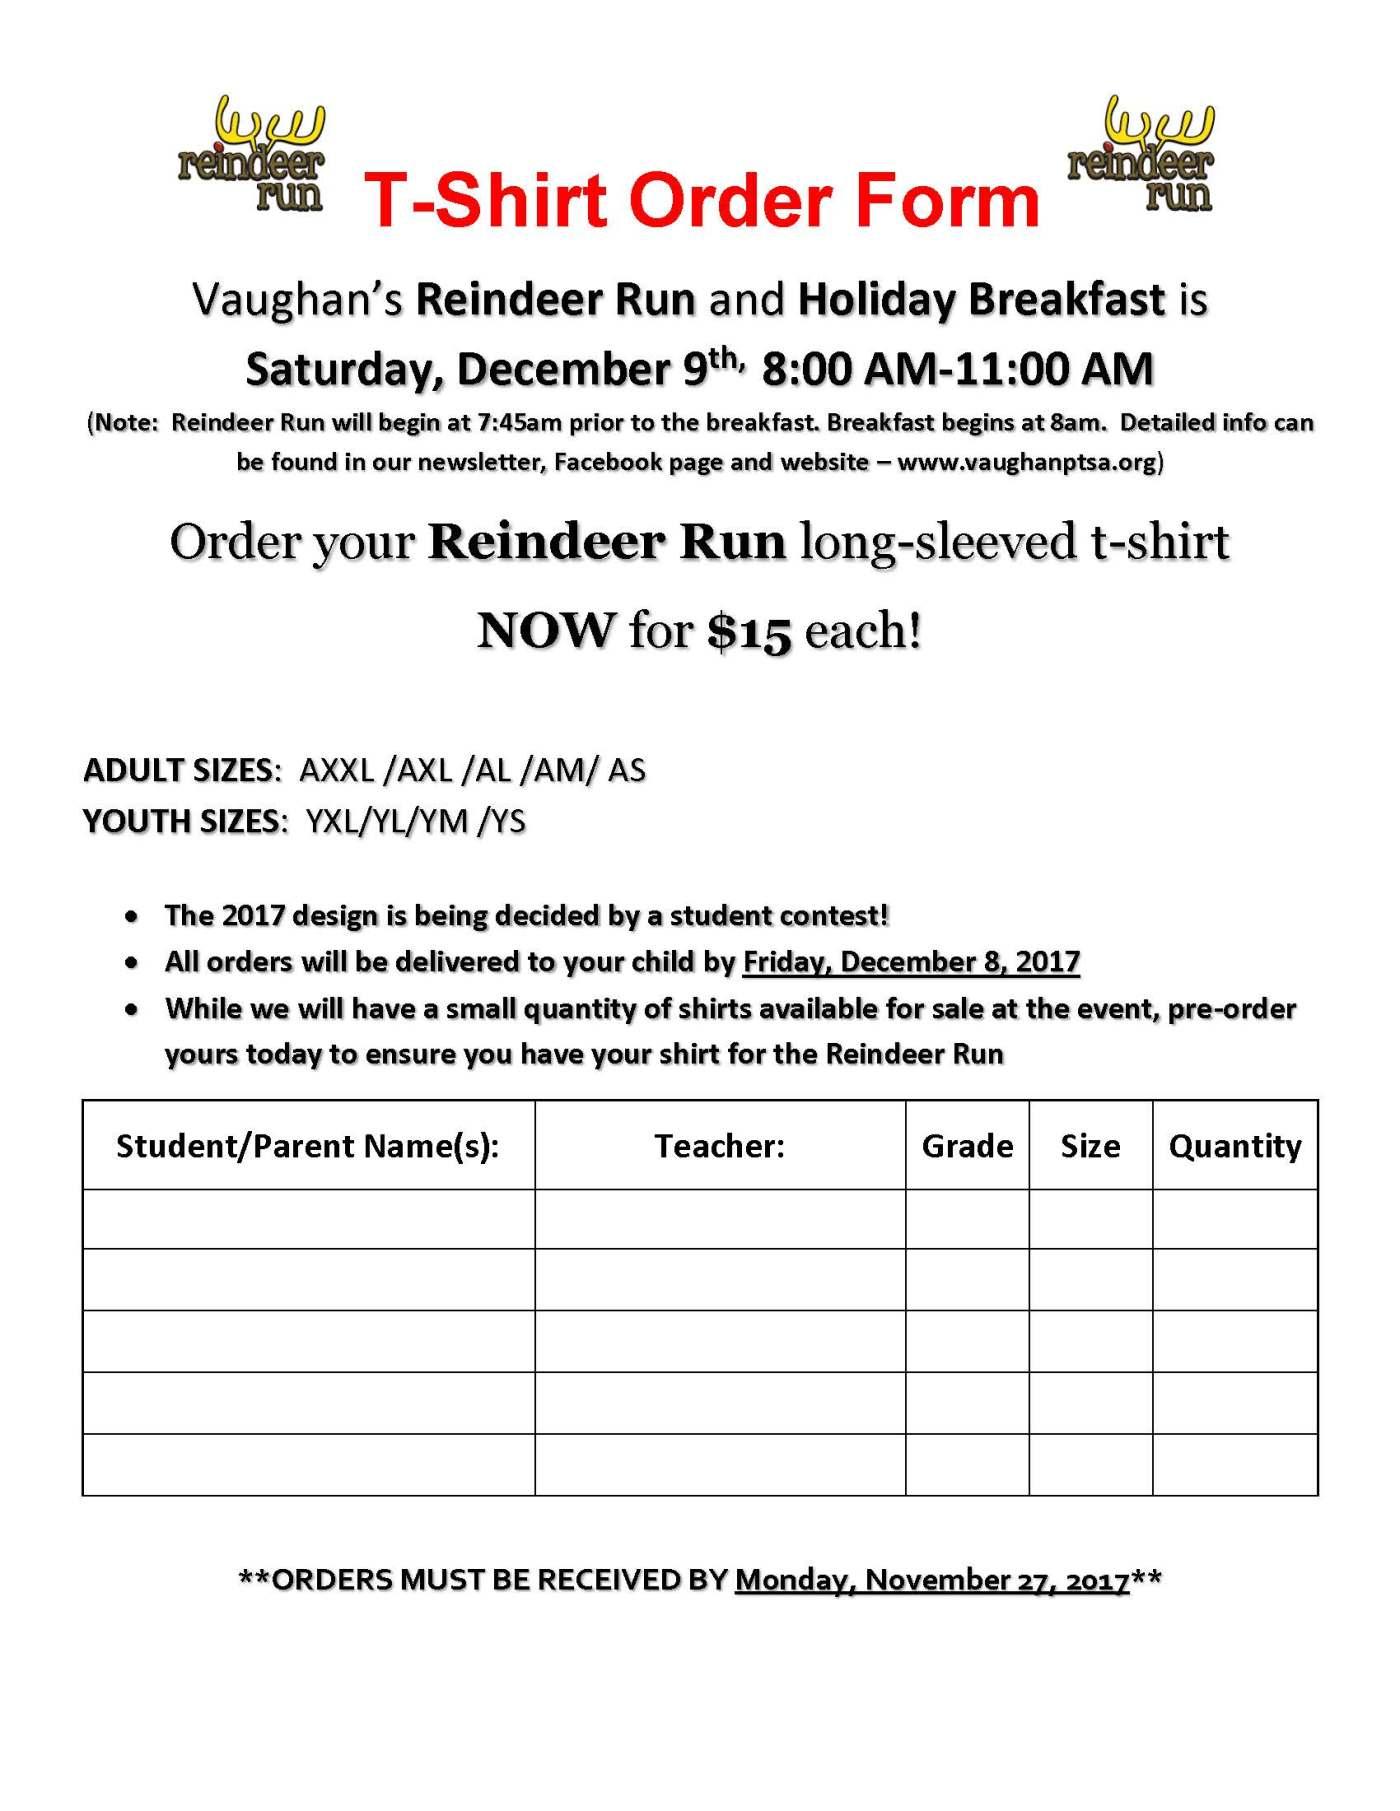 Reindeer Run TShirt Order Form – T Shirt Order Form